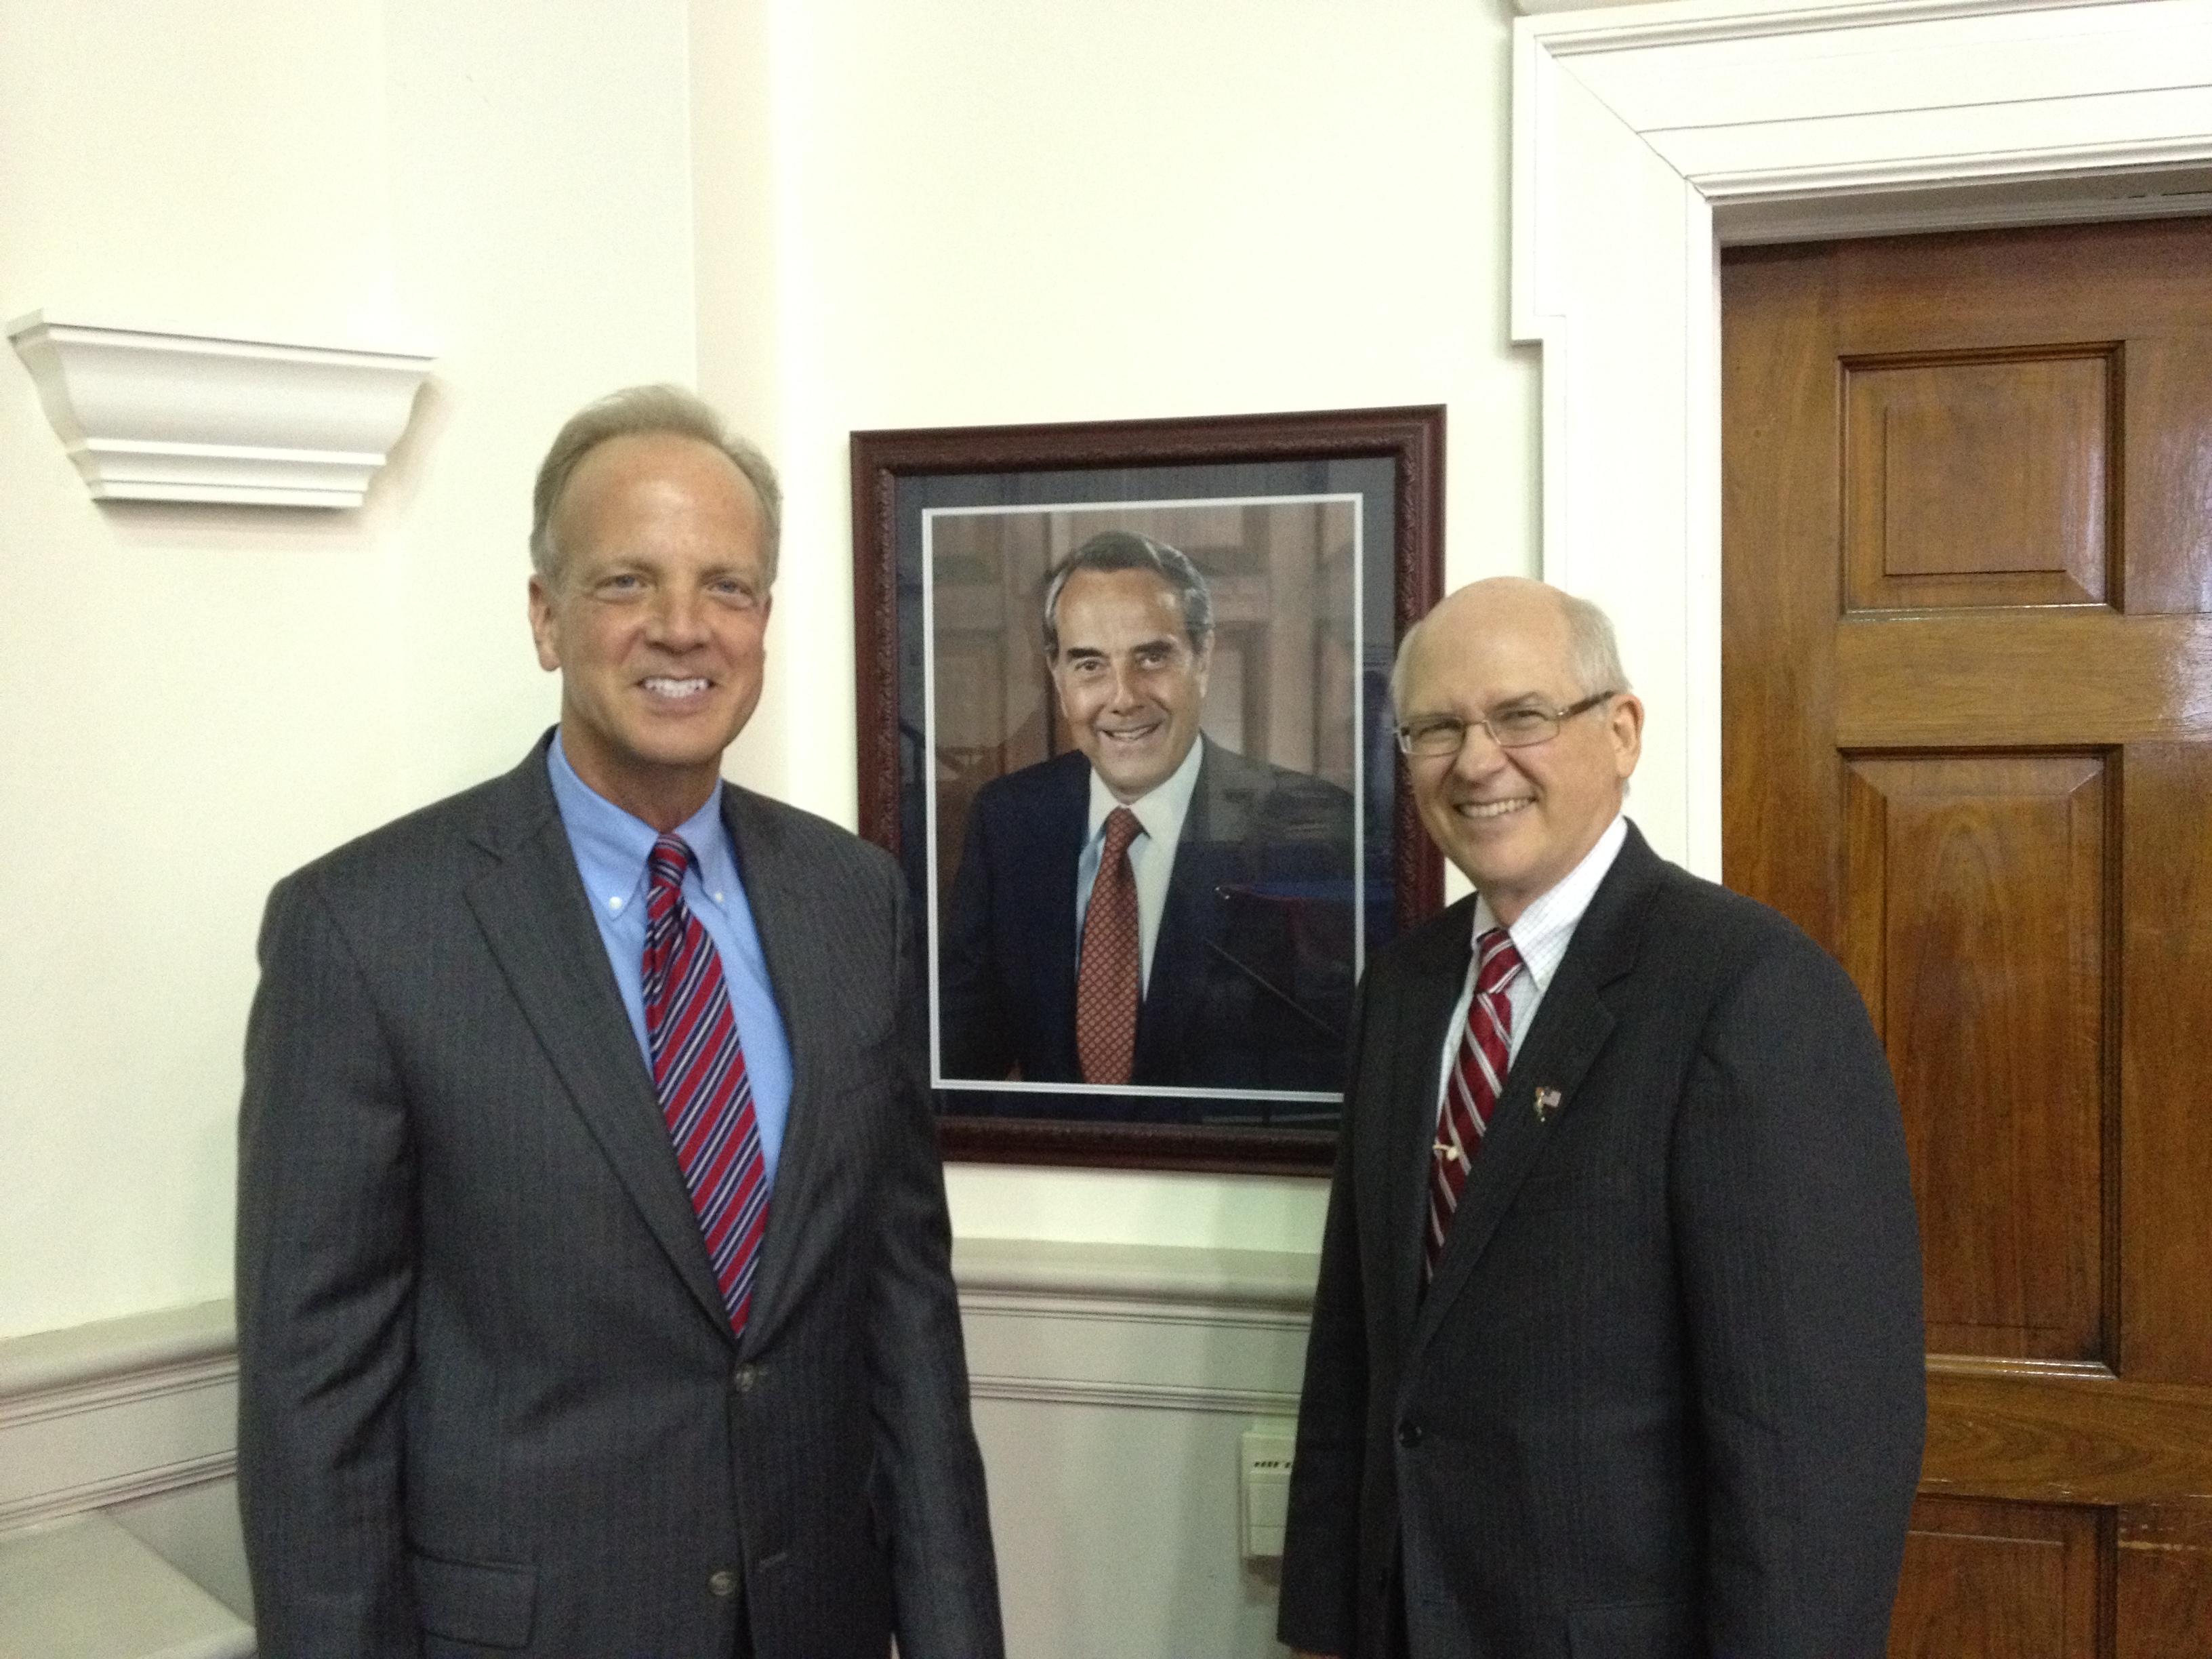 Sen. Moran Attends Retirement Ceremony for Tom Sanders